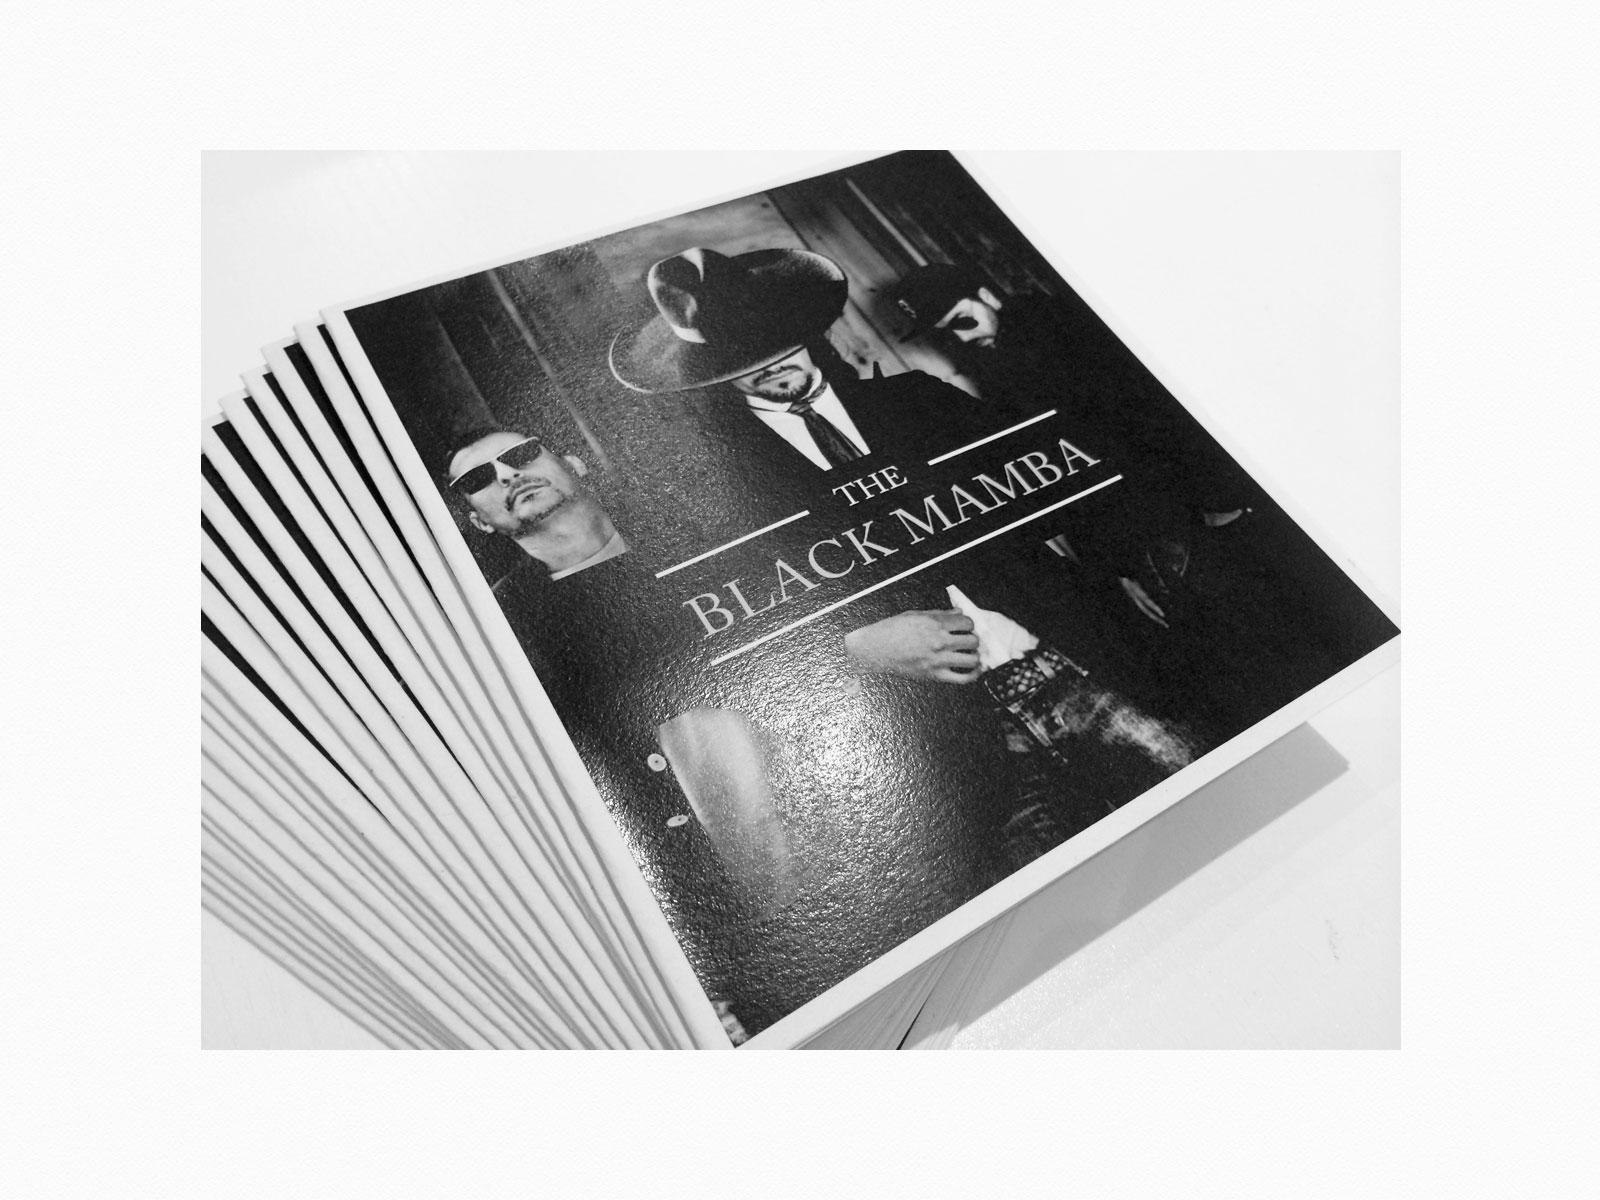 THE BLACK MAMBA - WOMEX NETHERLANDS - 0